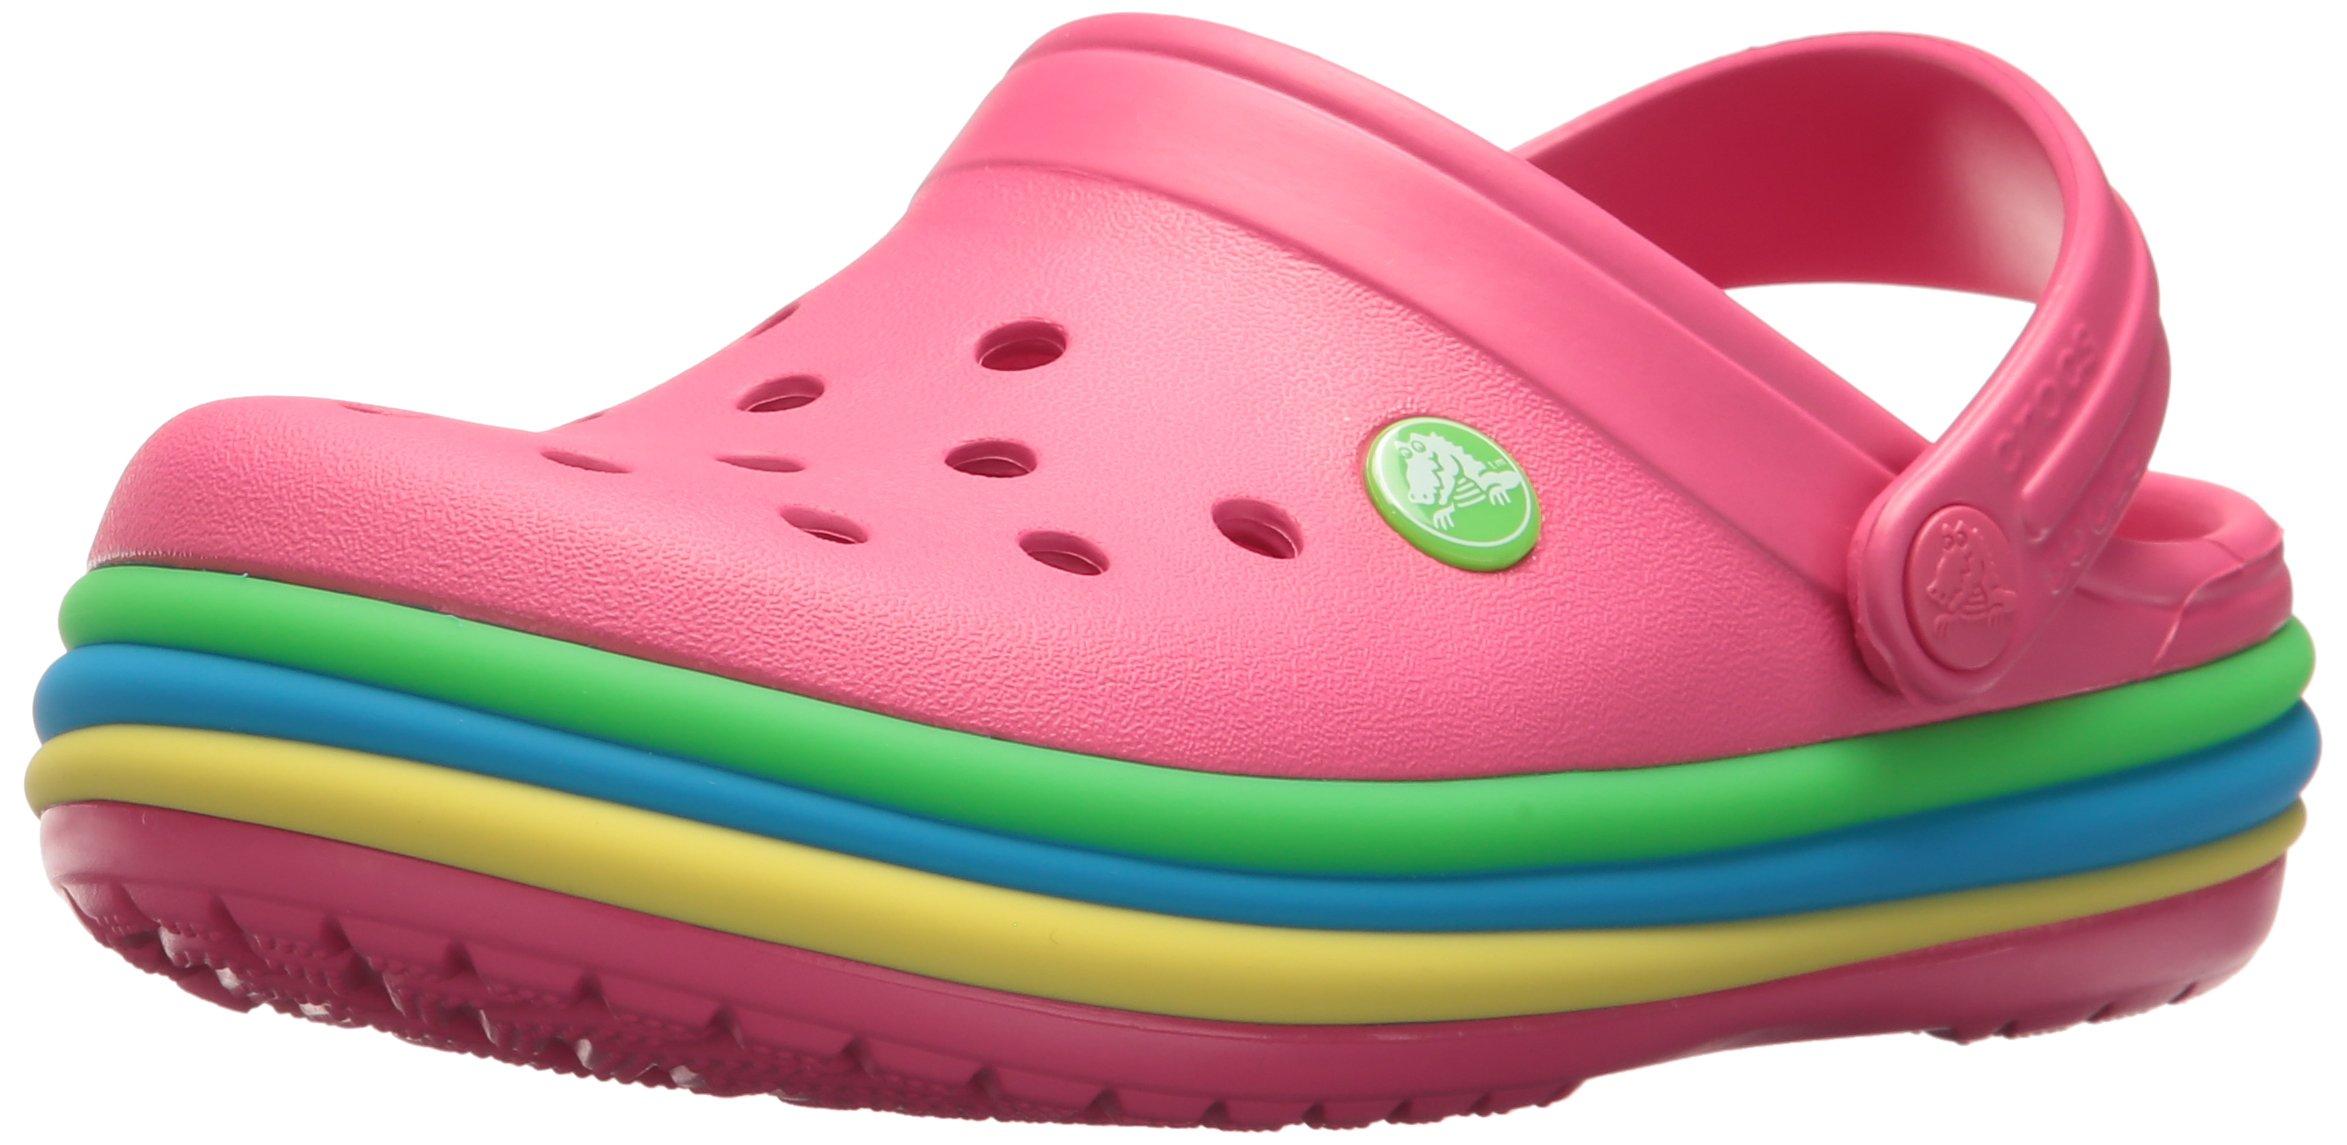 Crocs Unisex-Kids CB Rainbow Band K Clog, Paradise Pink, 5 M US Toddler